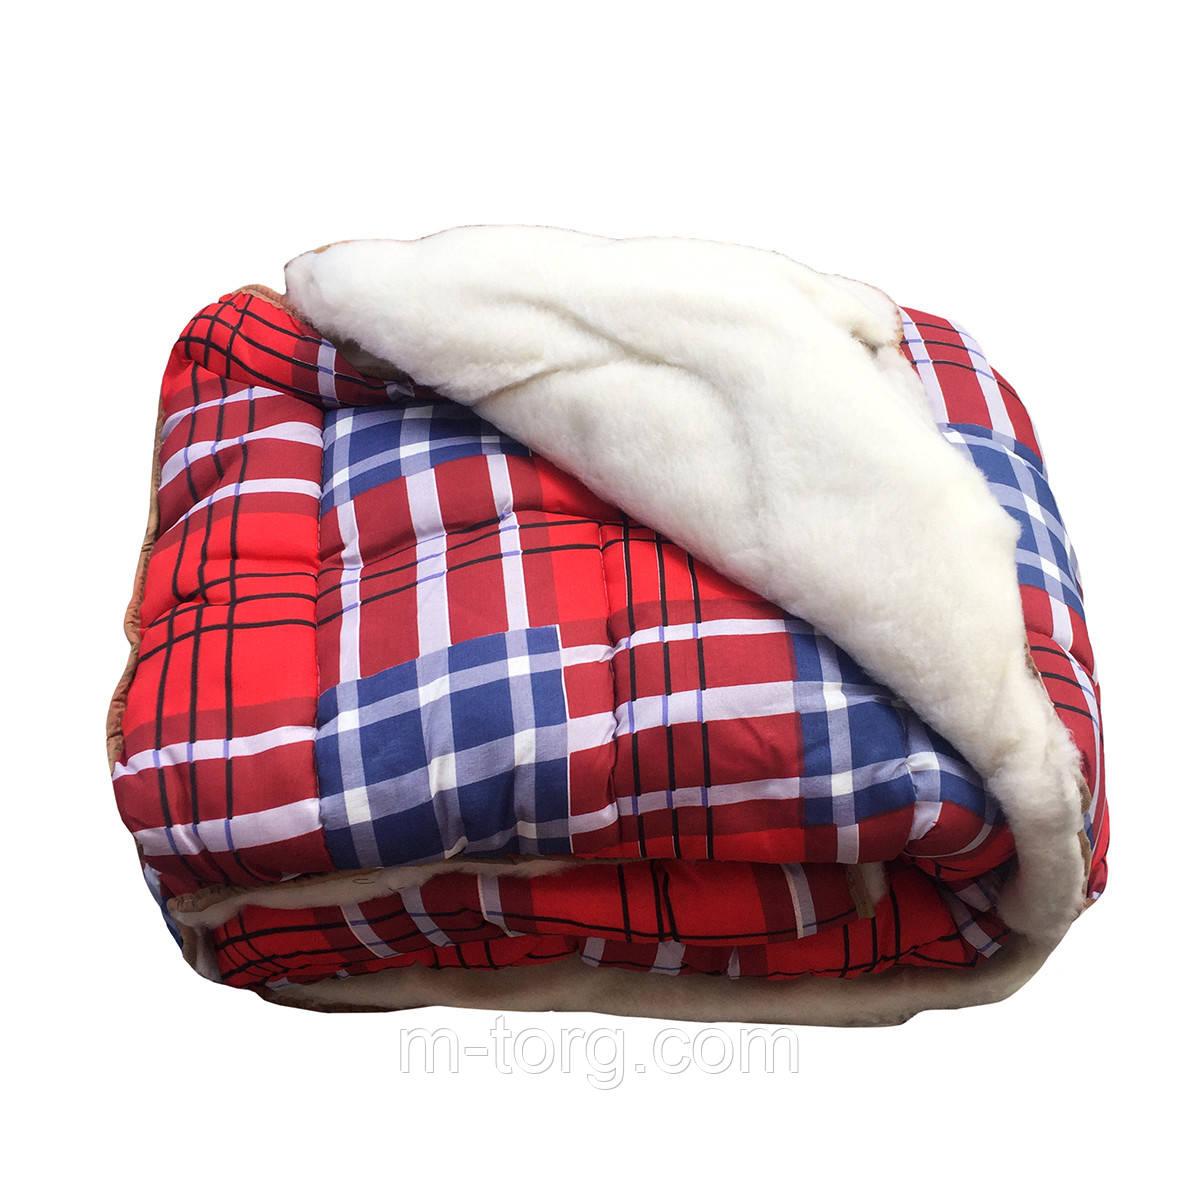 Недороге хутряне вовняну ковдру овеча двоспальне 175/215,тканина полікотон